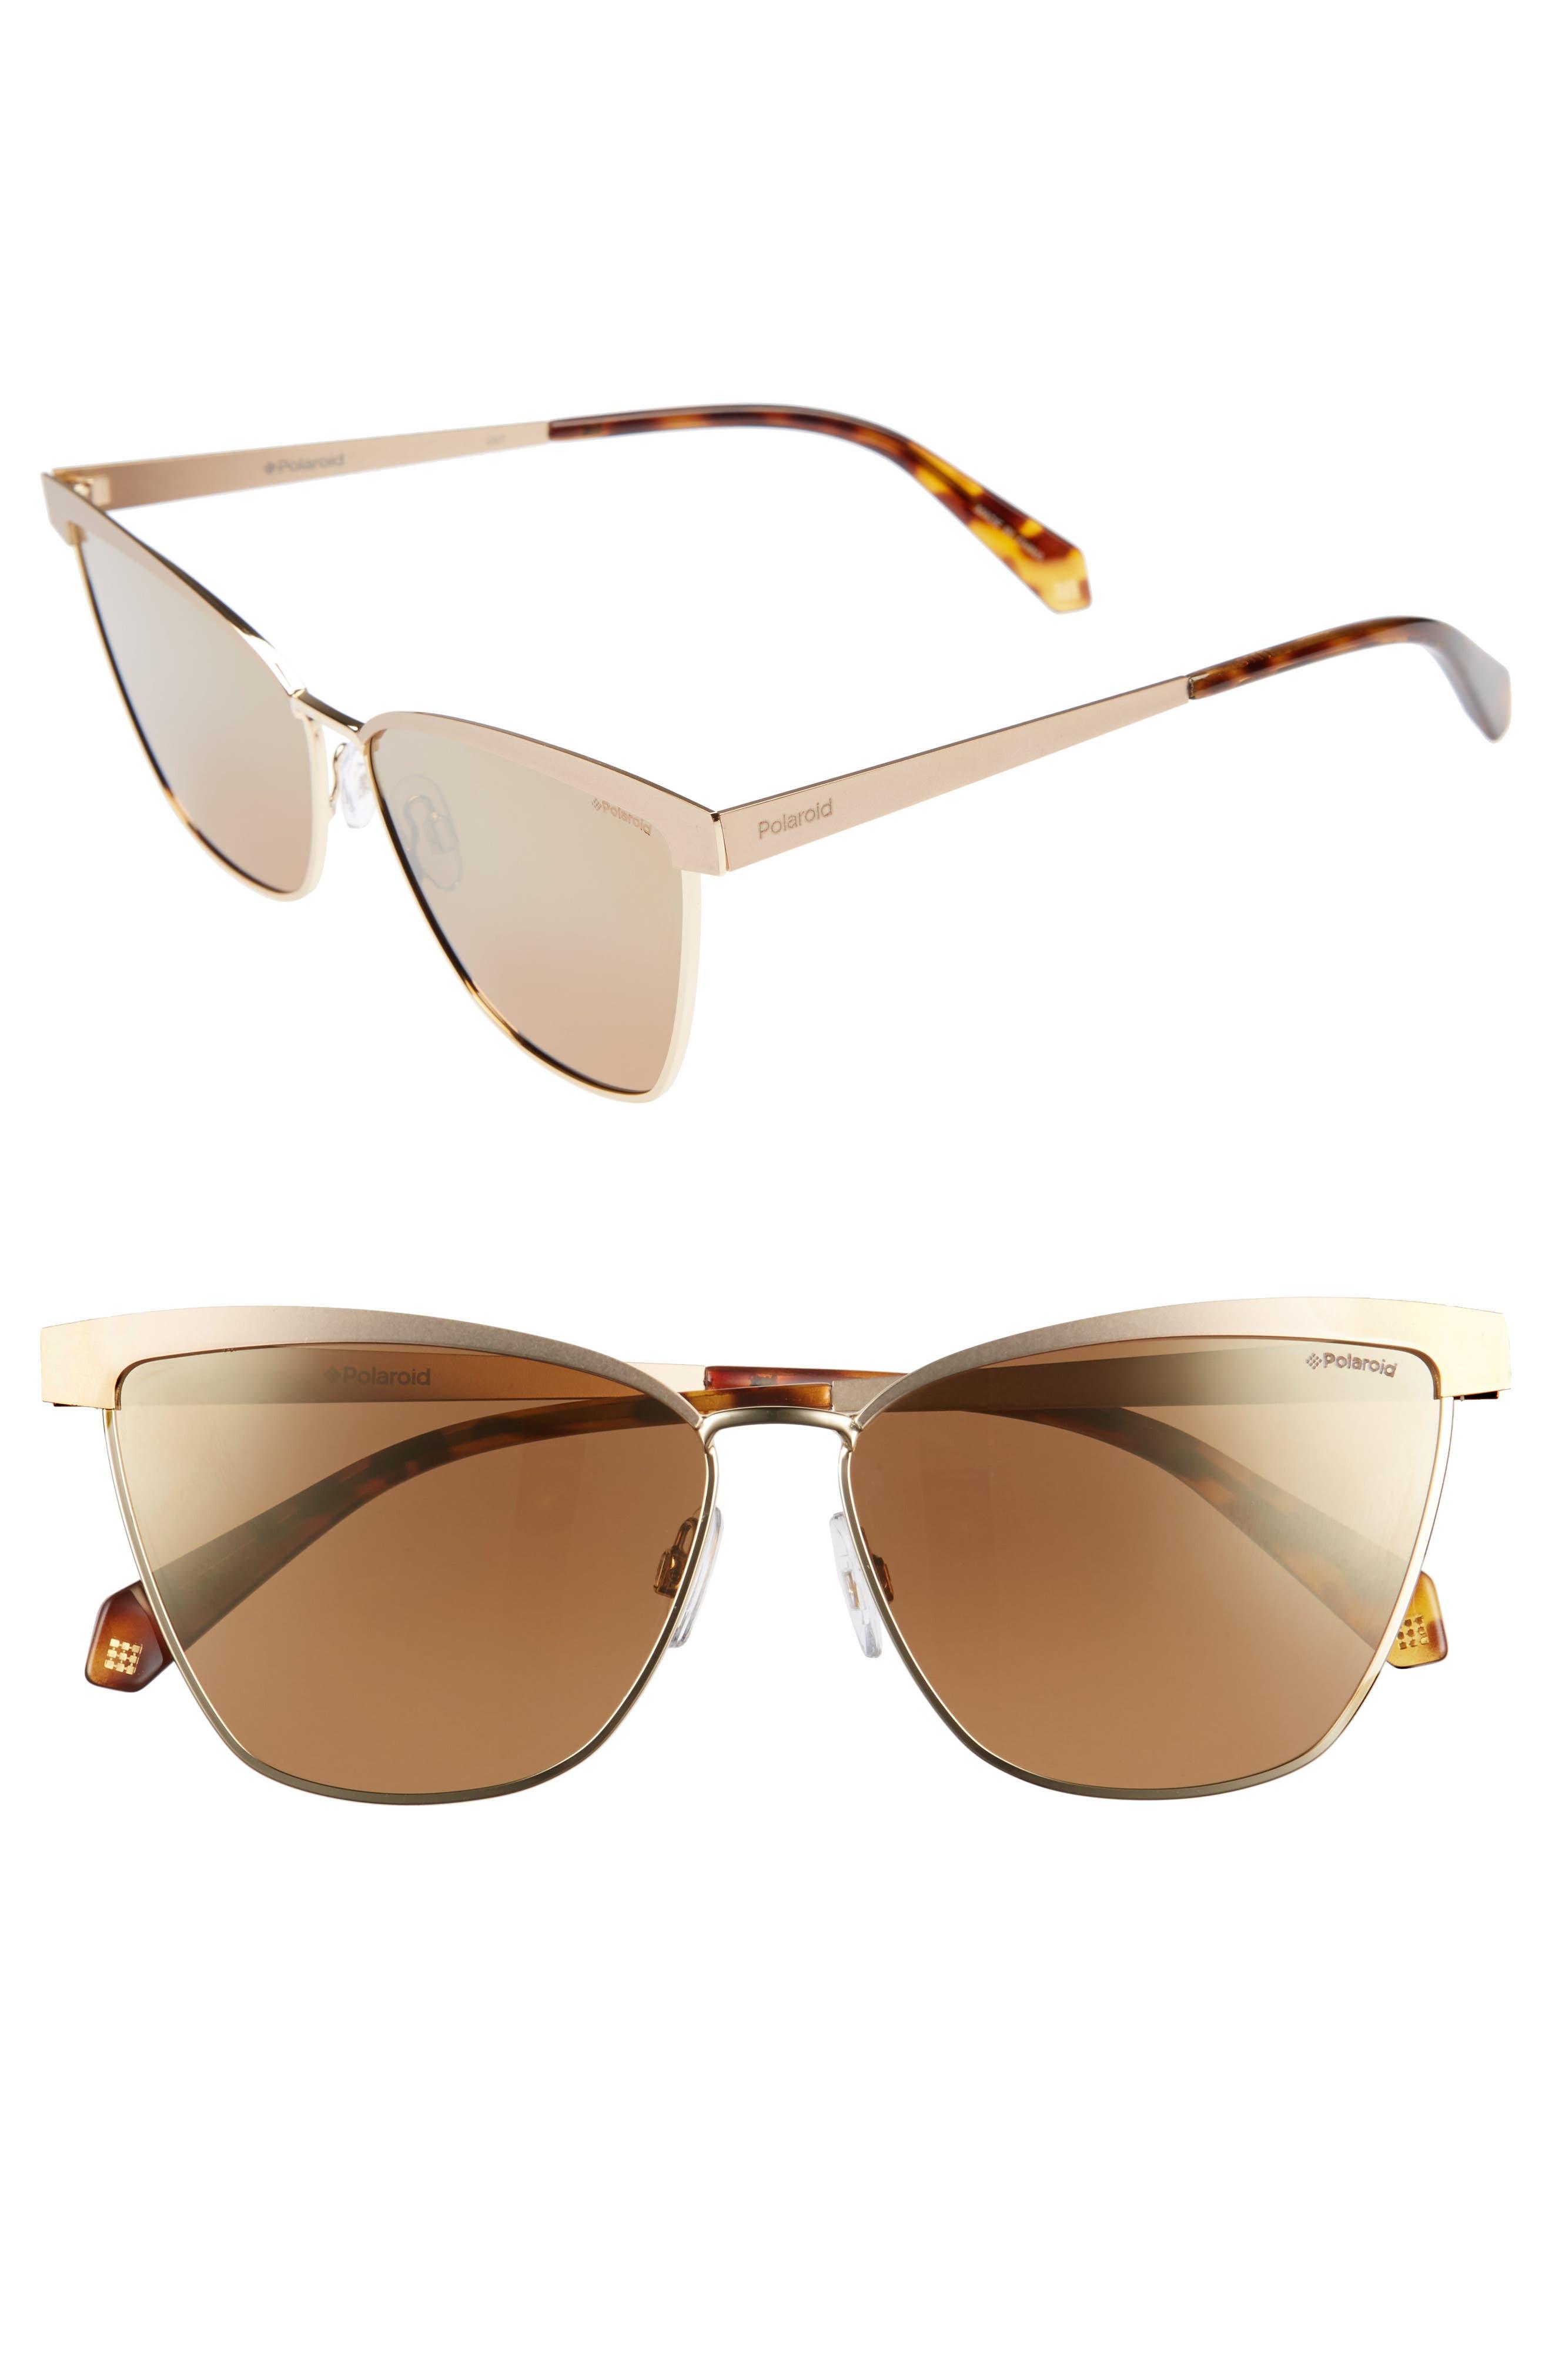 60mm Polarized Cat Eye Sunglasses,                             Main thumbnail 1, color,                             Gold